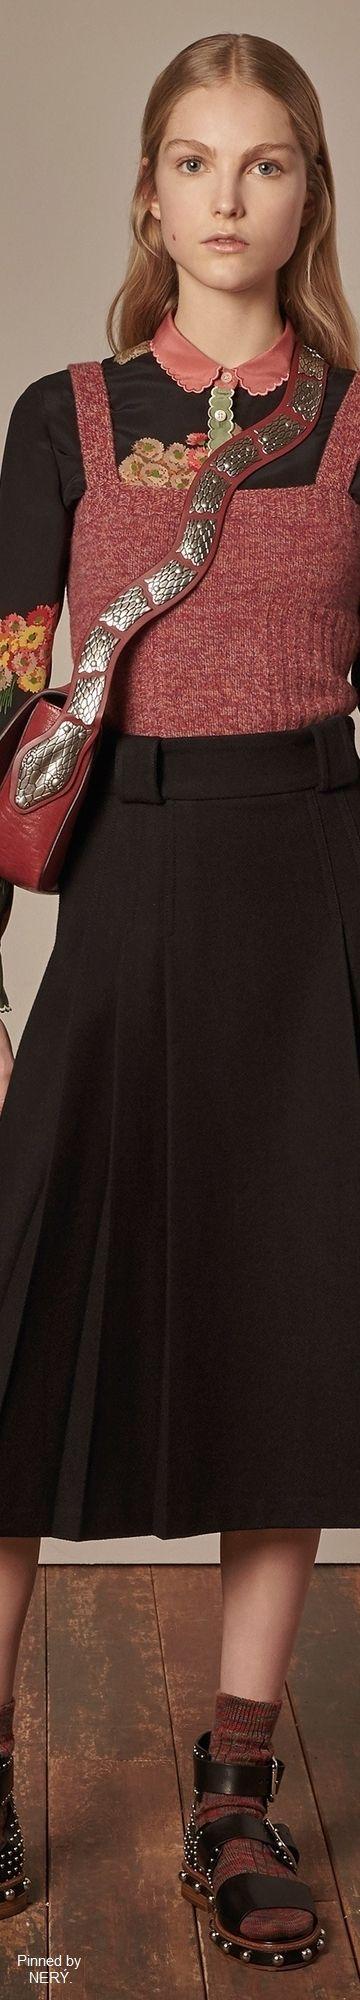 Red Valentino Fall 2017 RTW